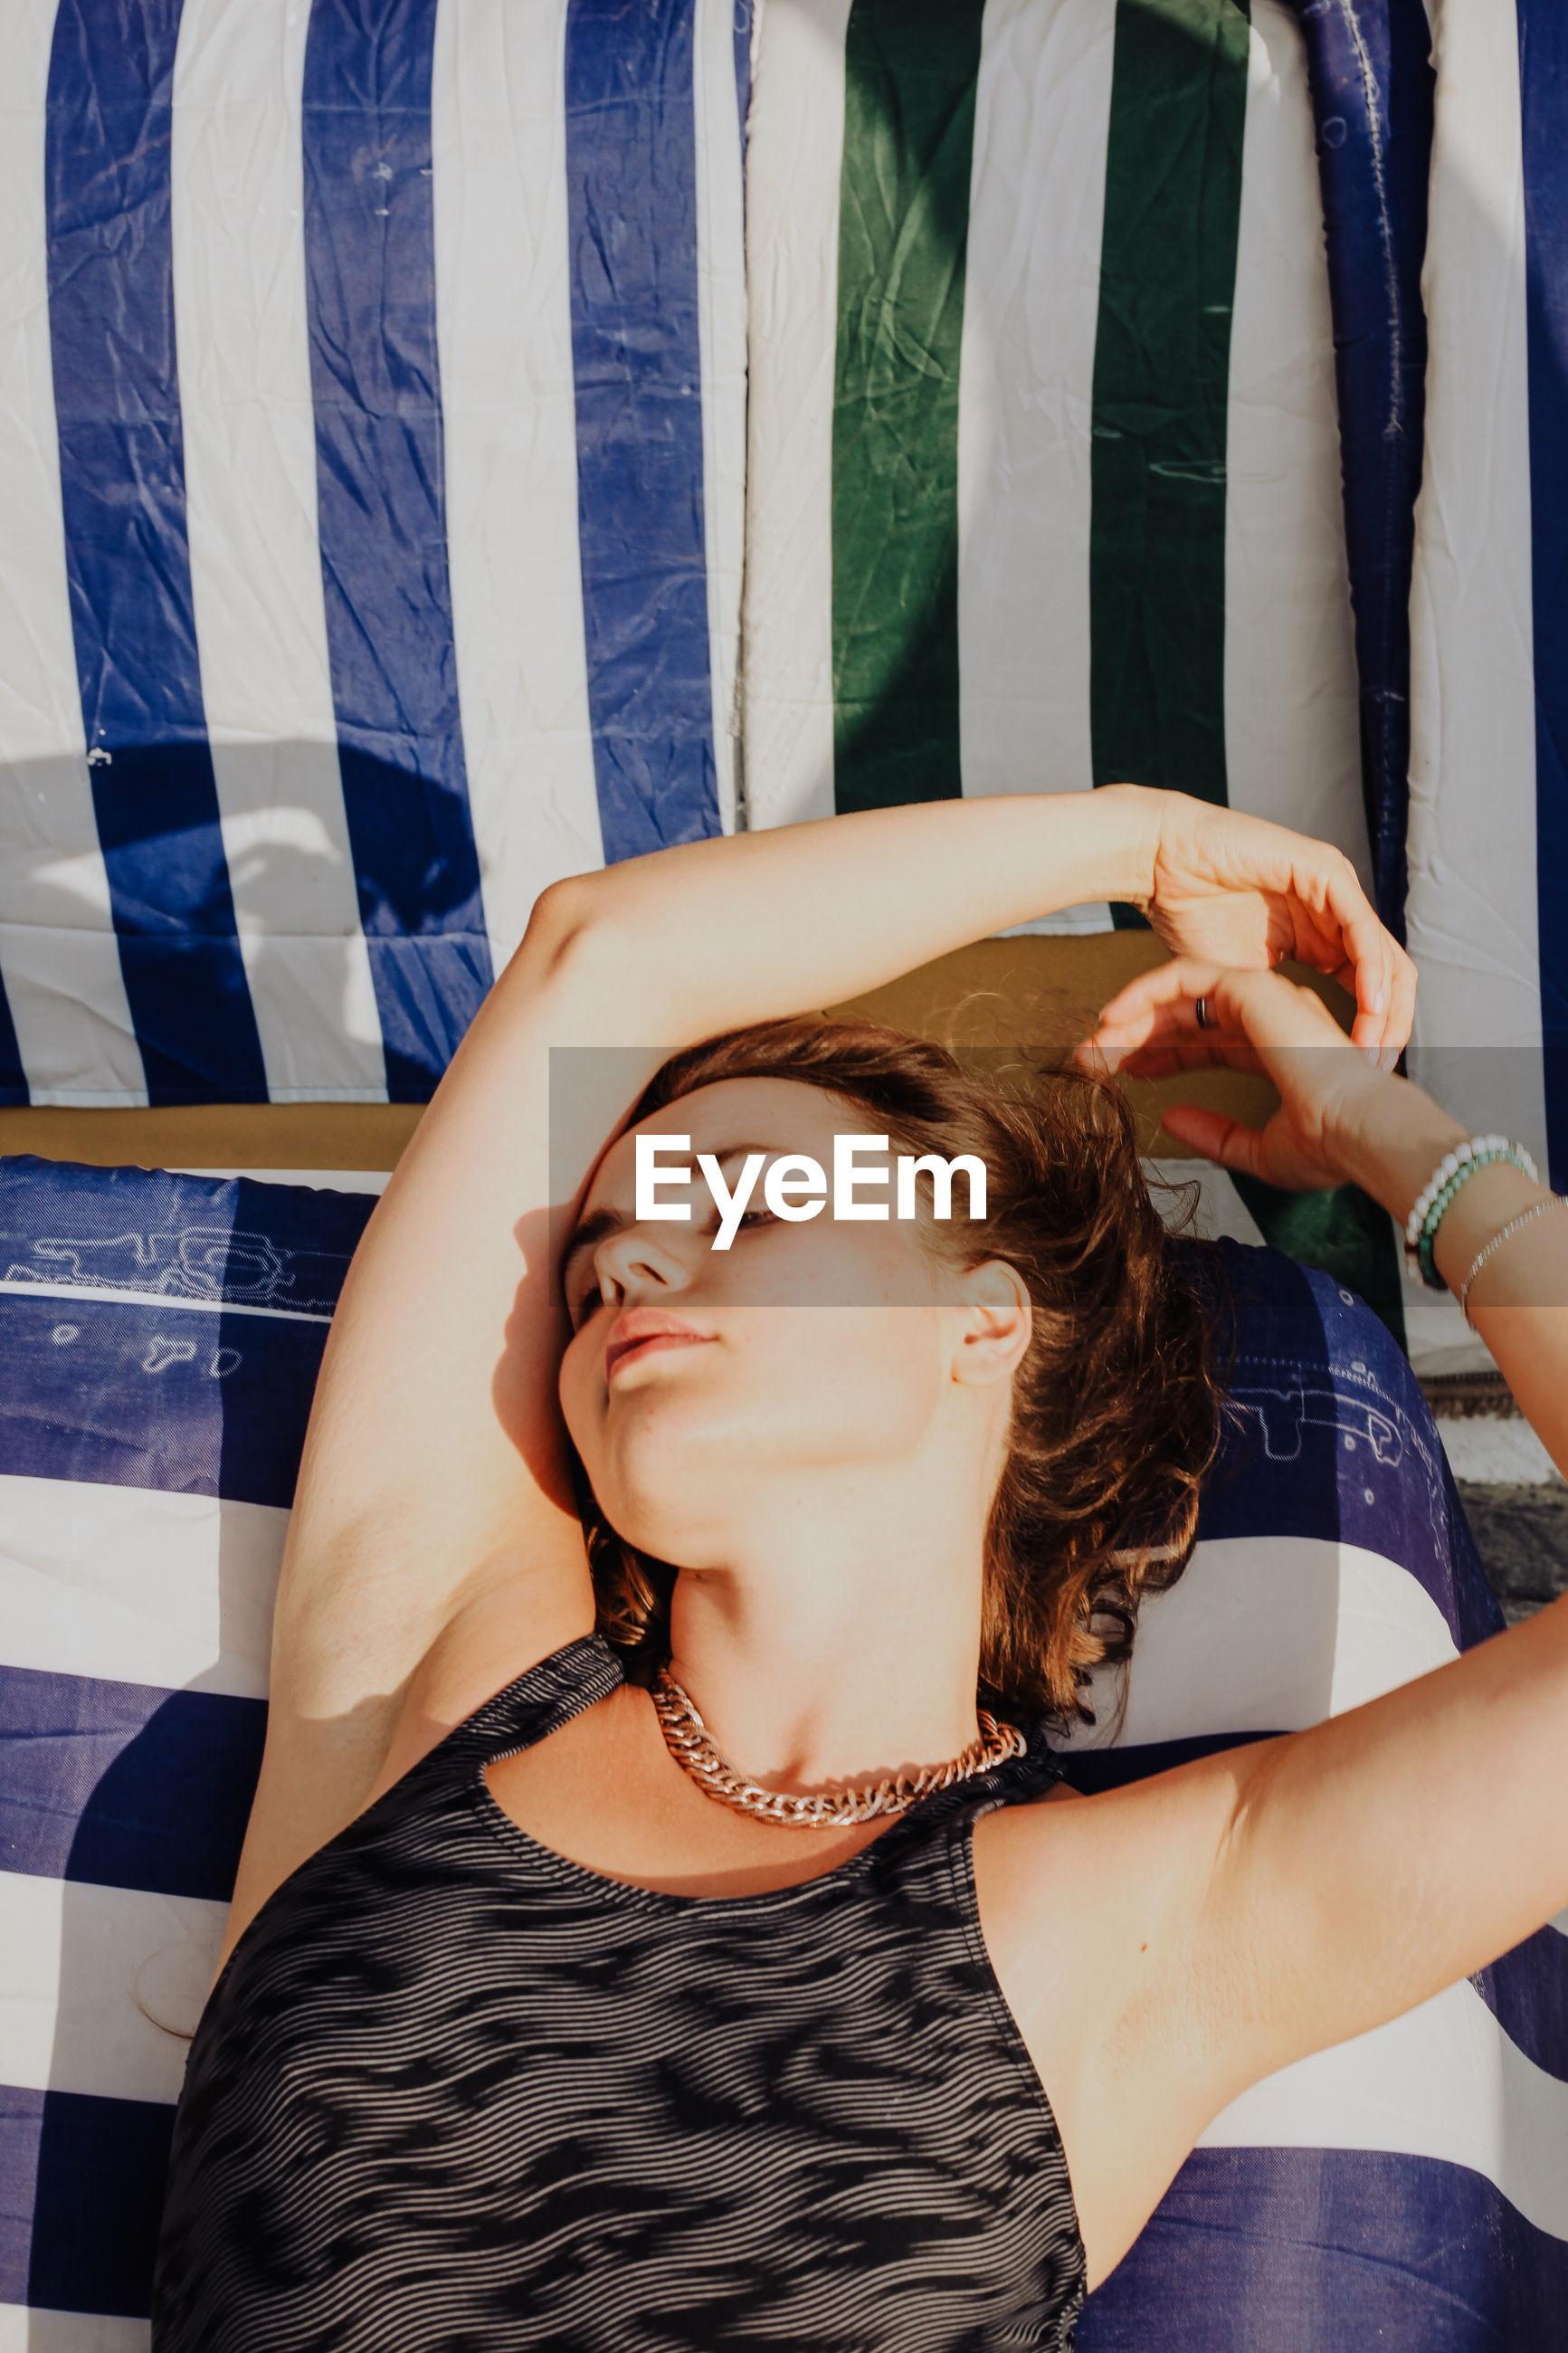 HIGH ANGLE VIEW OF YOUNG WOMAN LYING ON FLOOR